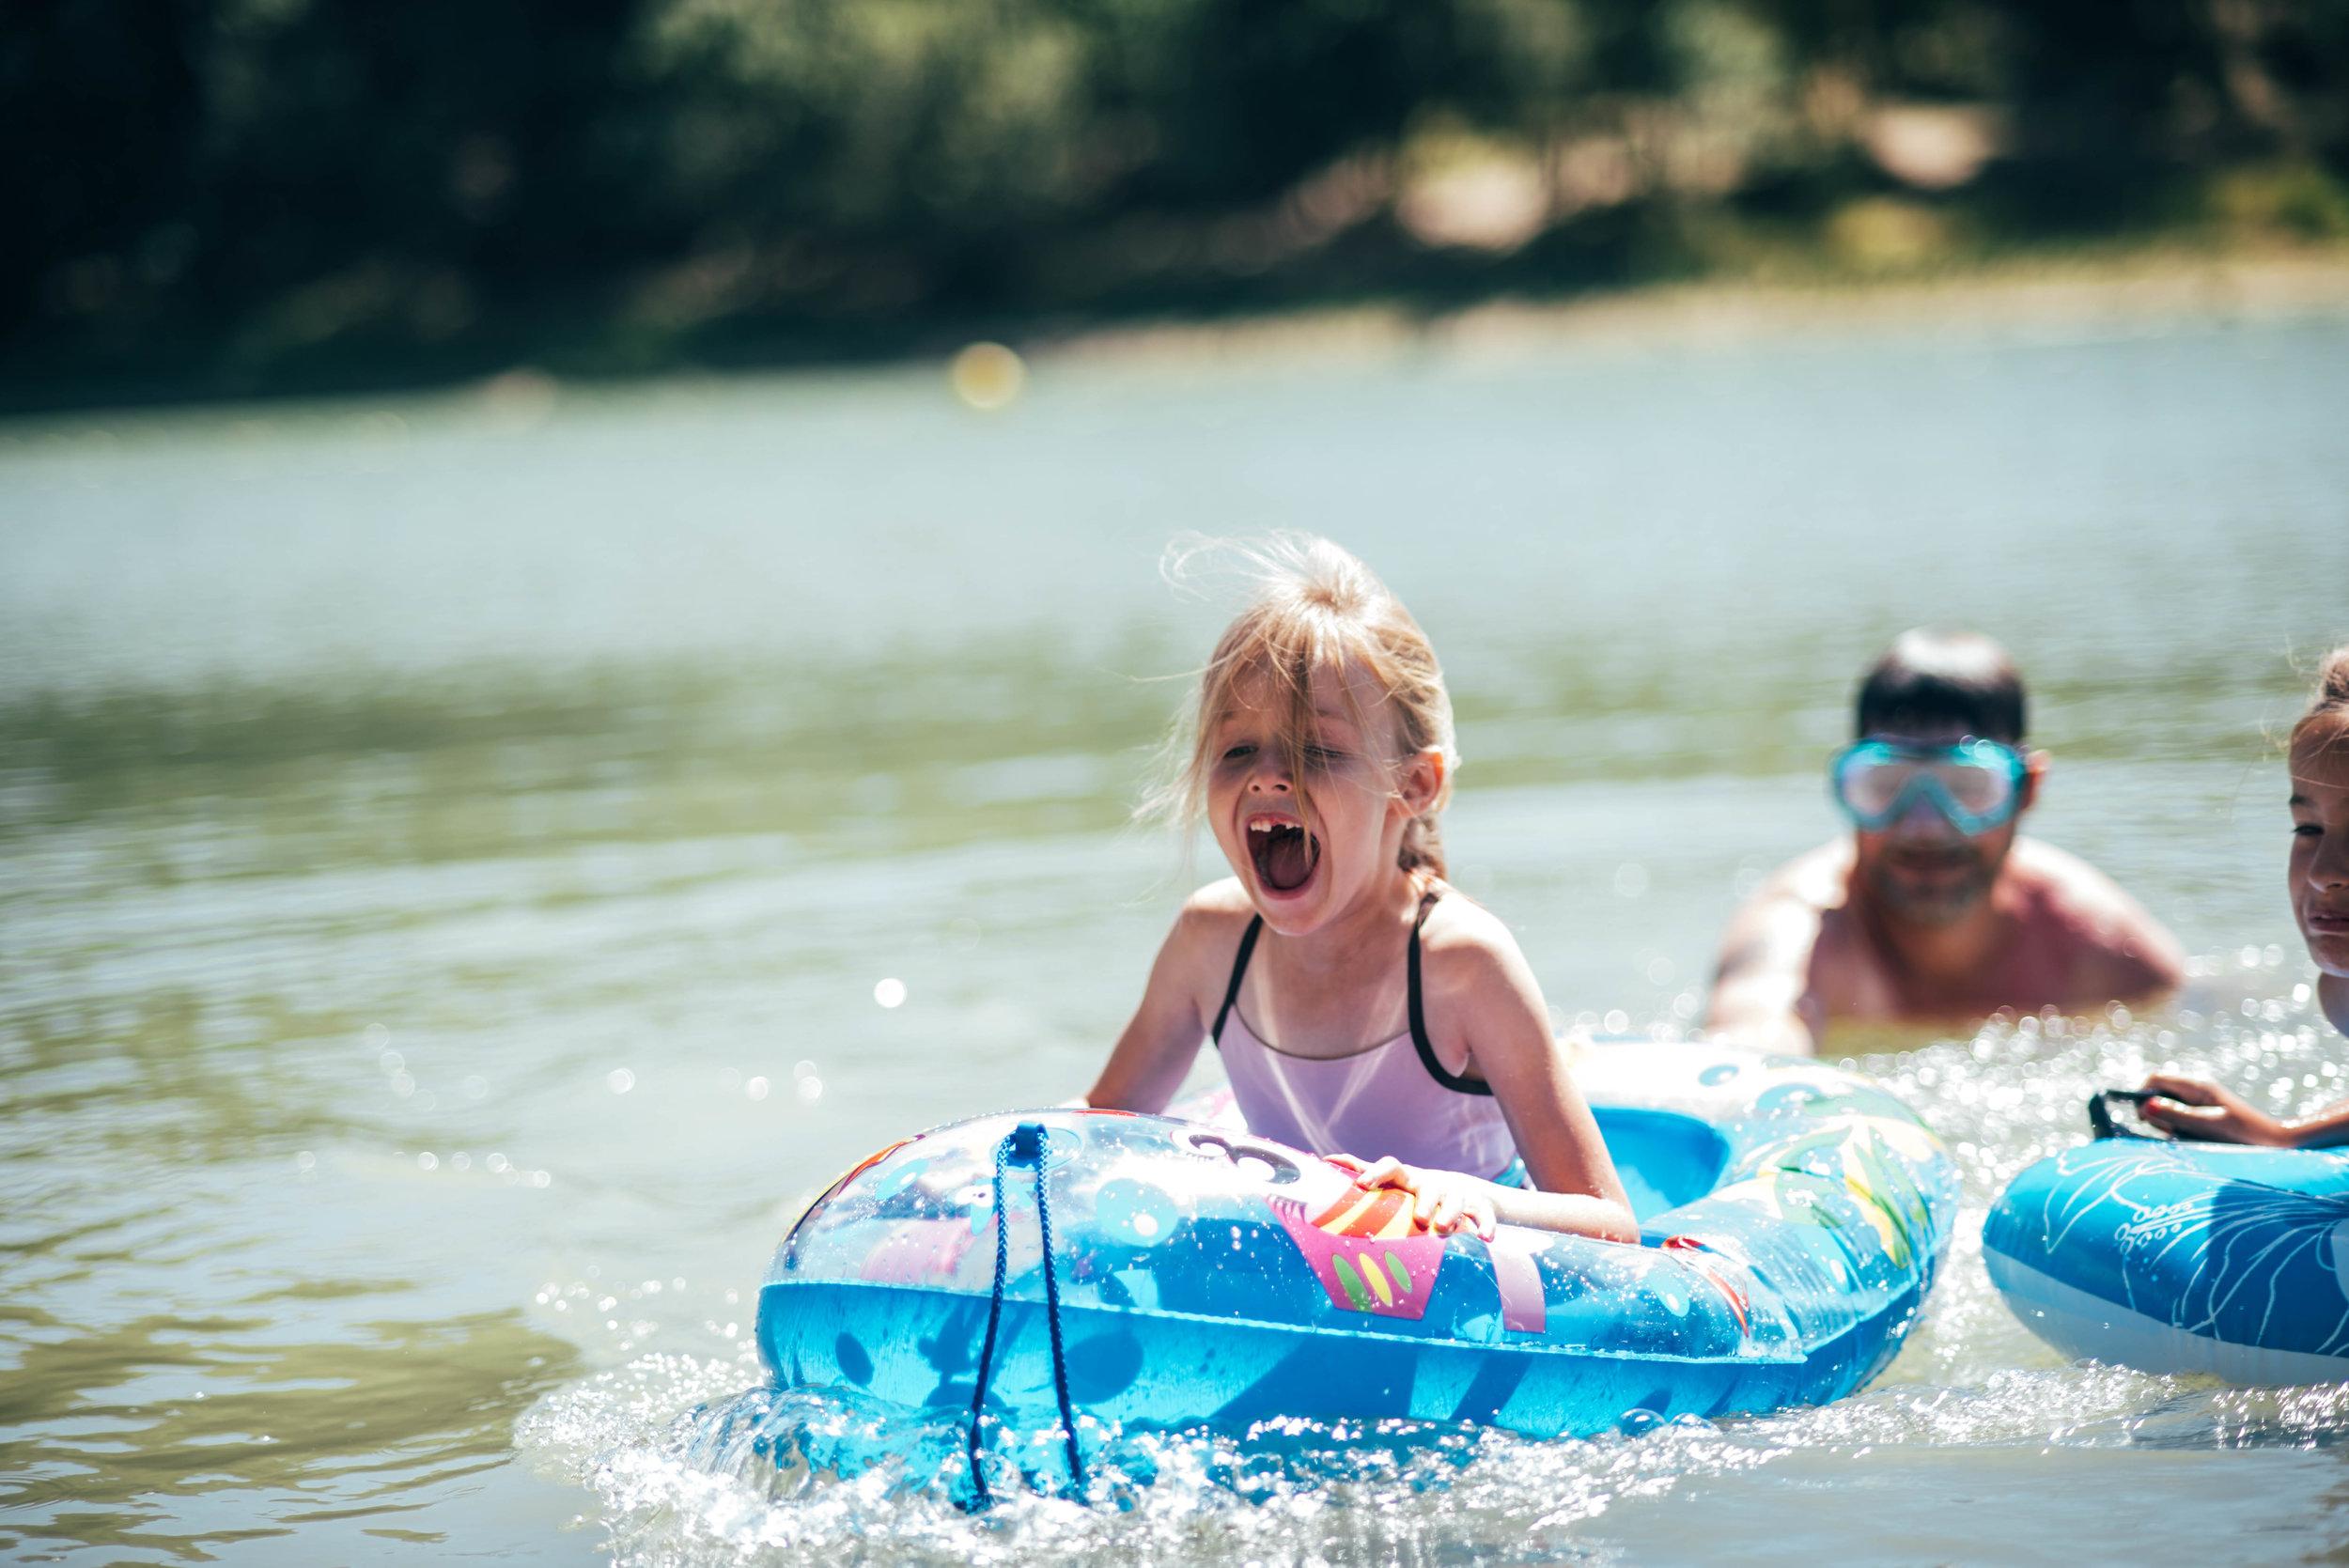 Little girl laughs in boat on lake Essex UK Documentary Portrait Photographer